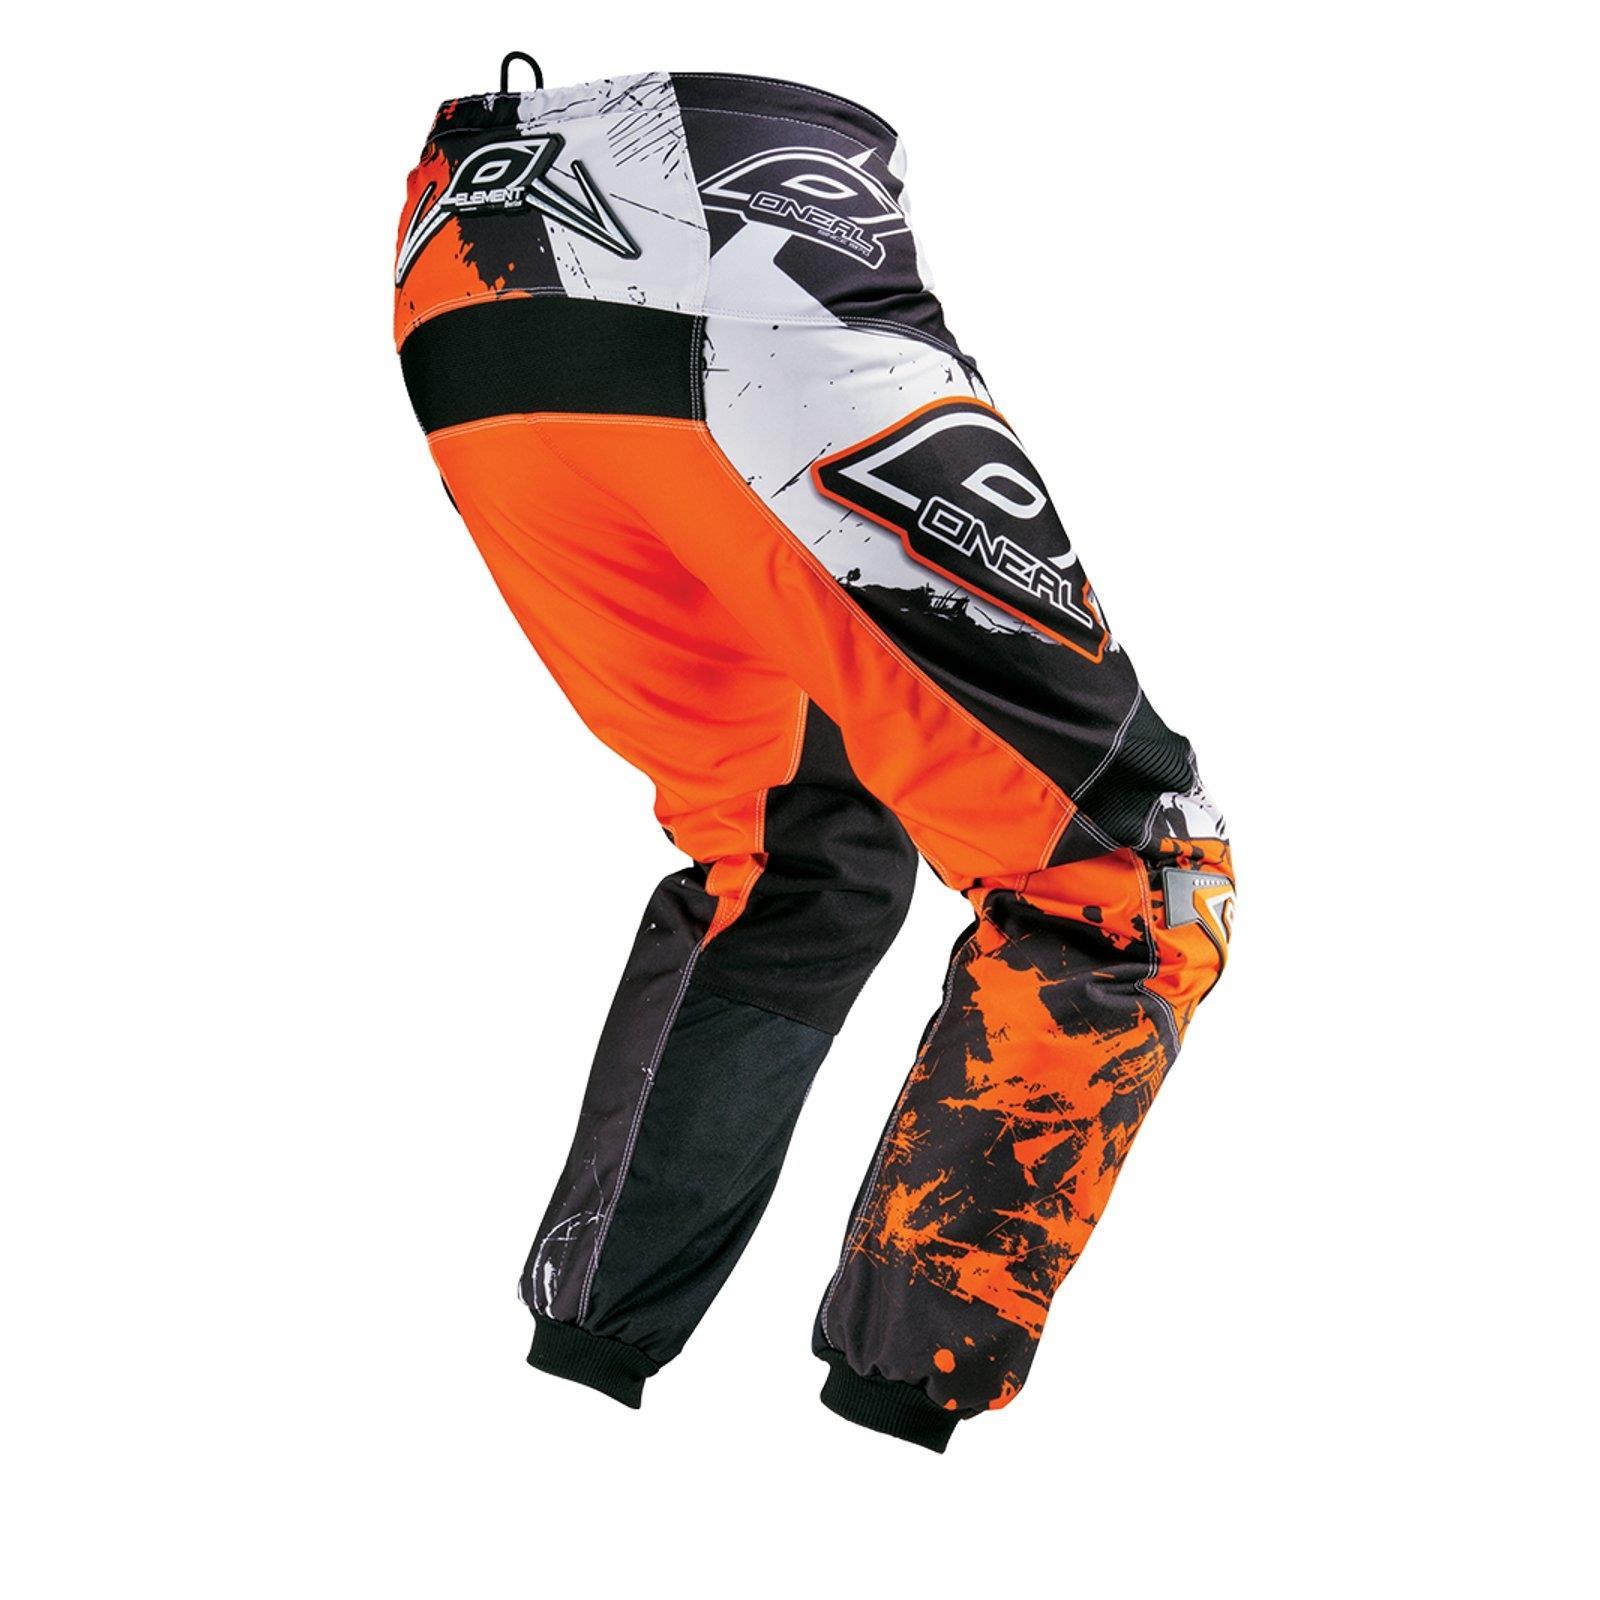 ONeal-pantalones-de-Jersey-de-los-ninos-de-pantalones-cortos-ninos-MX-bicicleta-DH-montana-bicicleta miniatura 61